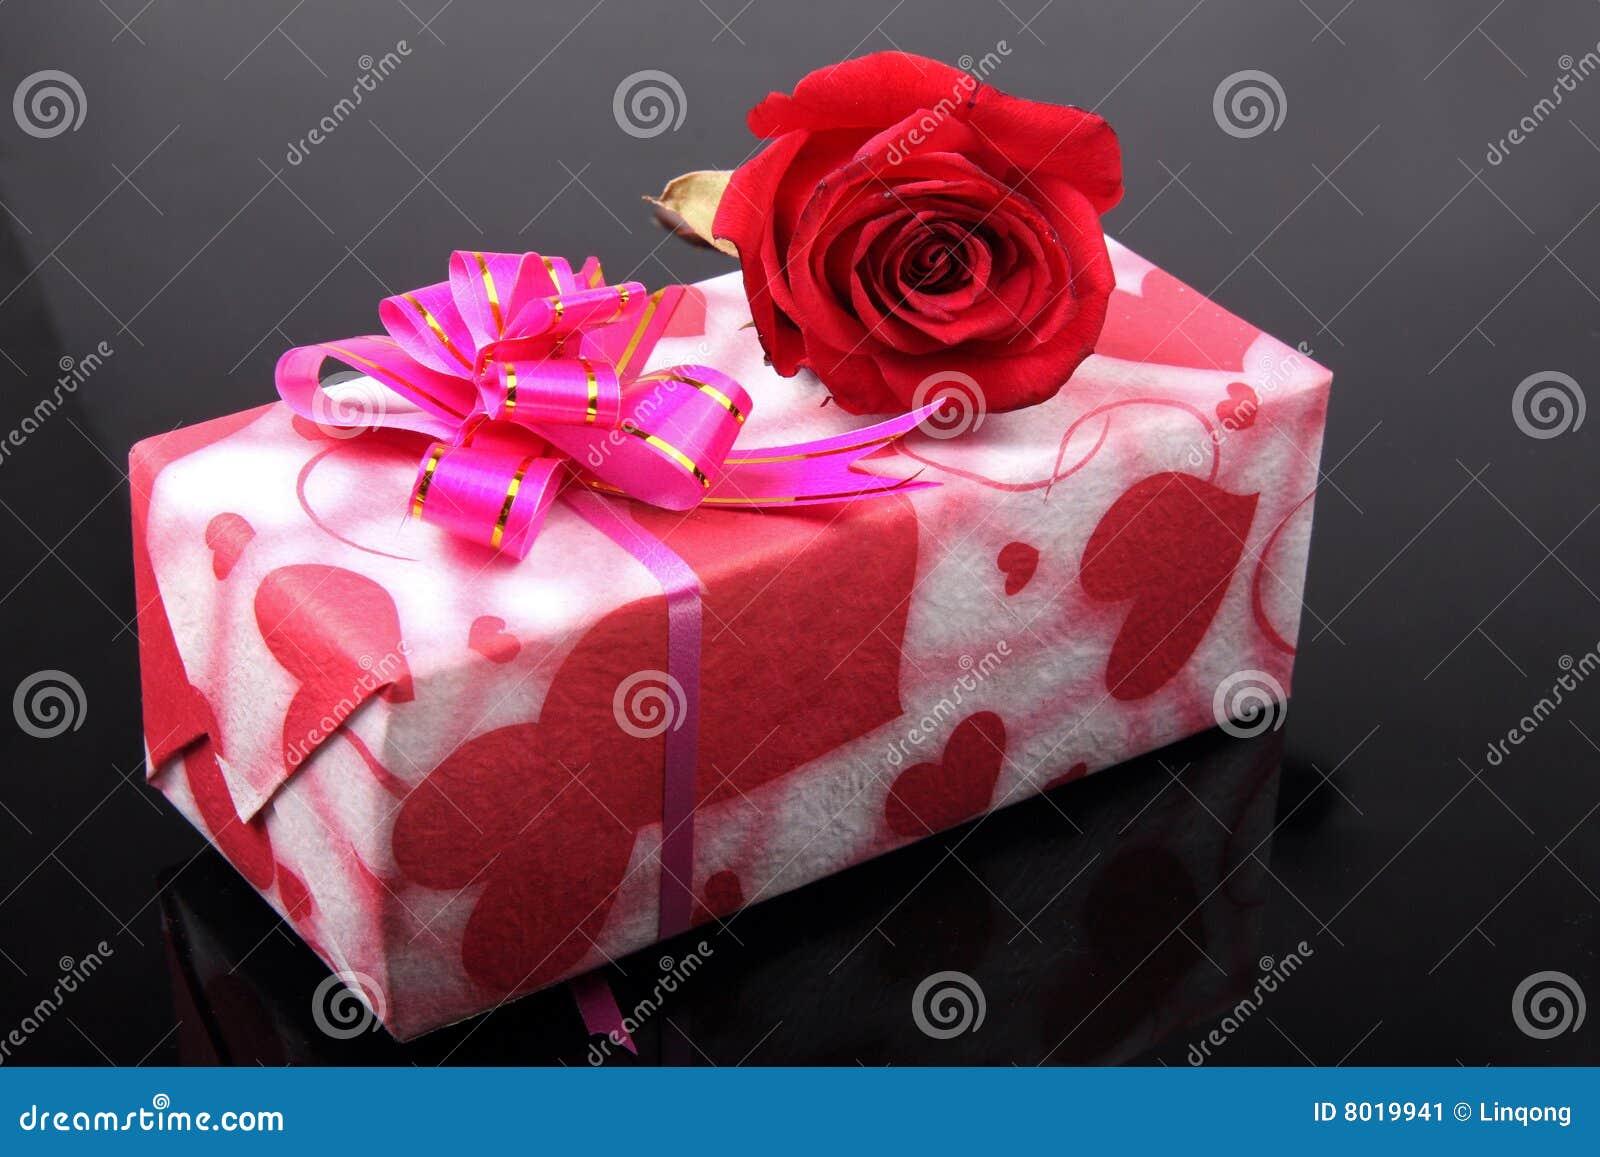 Beautiful Gift Box With Rose Stock Image - Image: 8019941